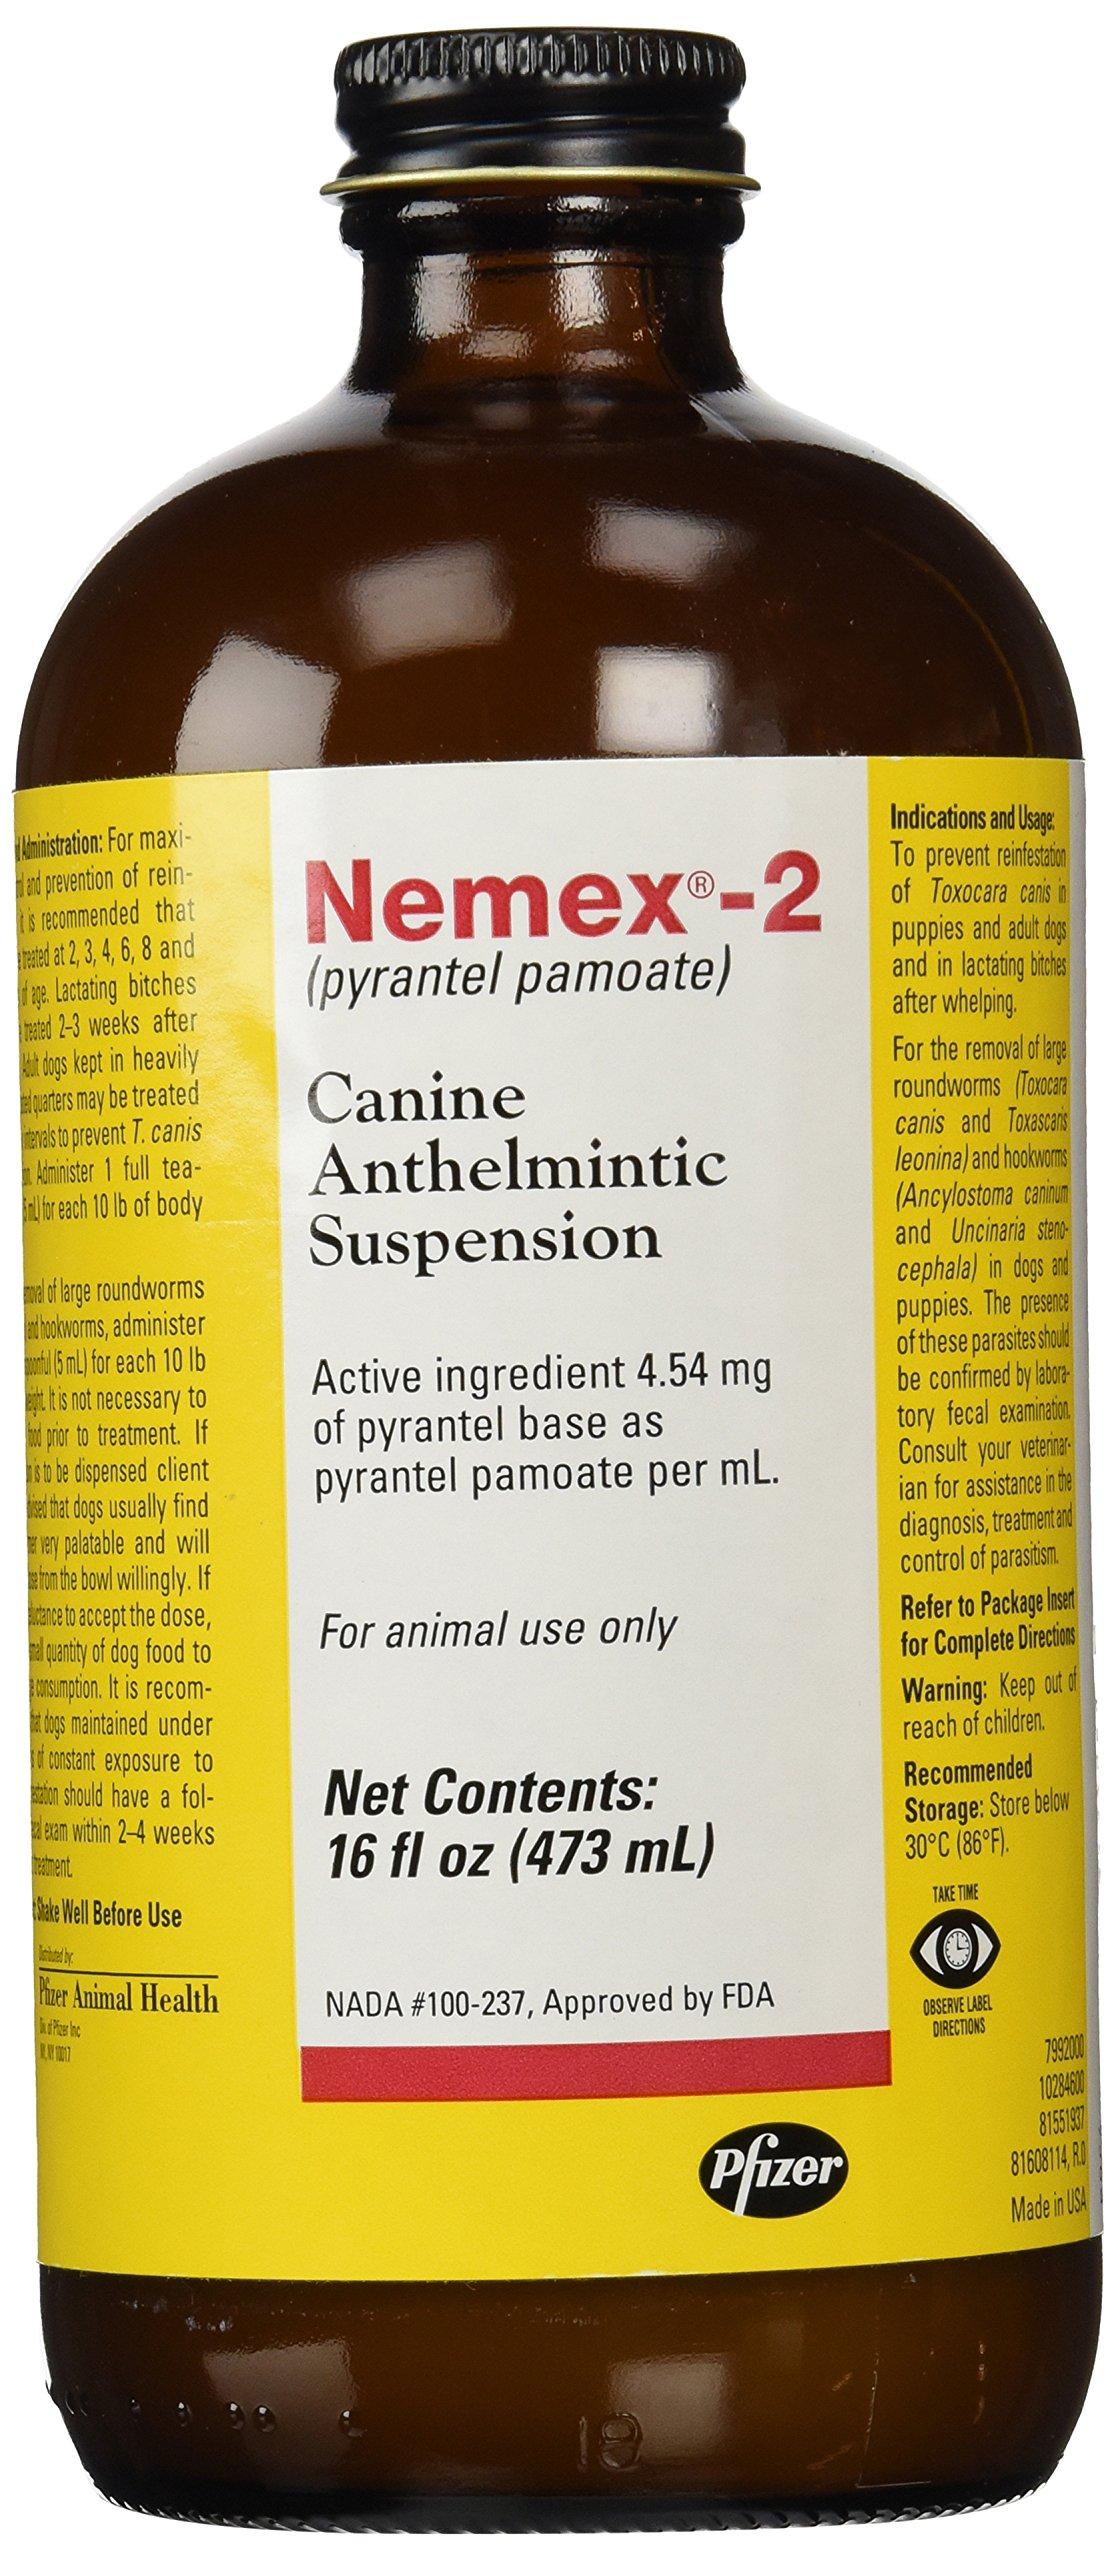 Nemex Pfizer 2 Canine Anthelmintic Dog De-Wormer, 16-Ounce by Nemex